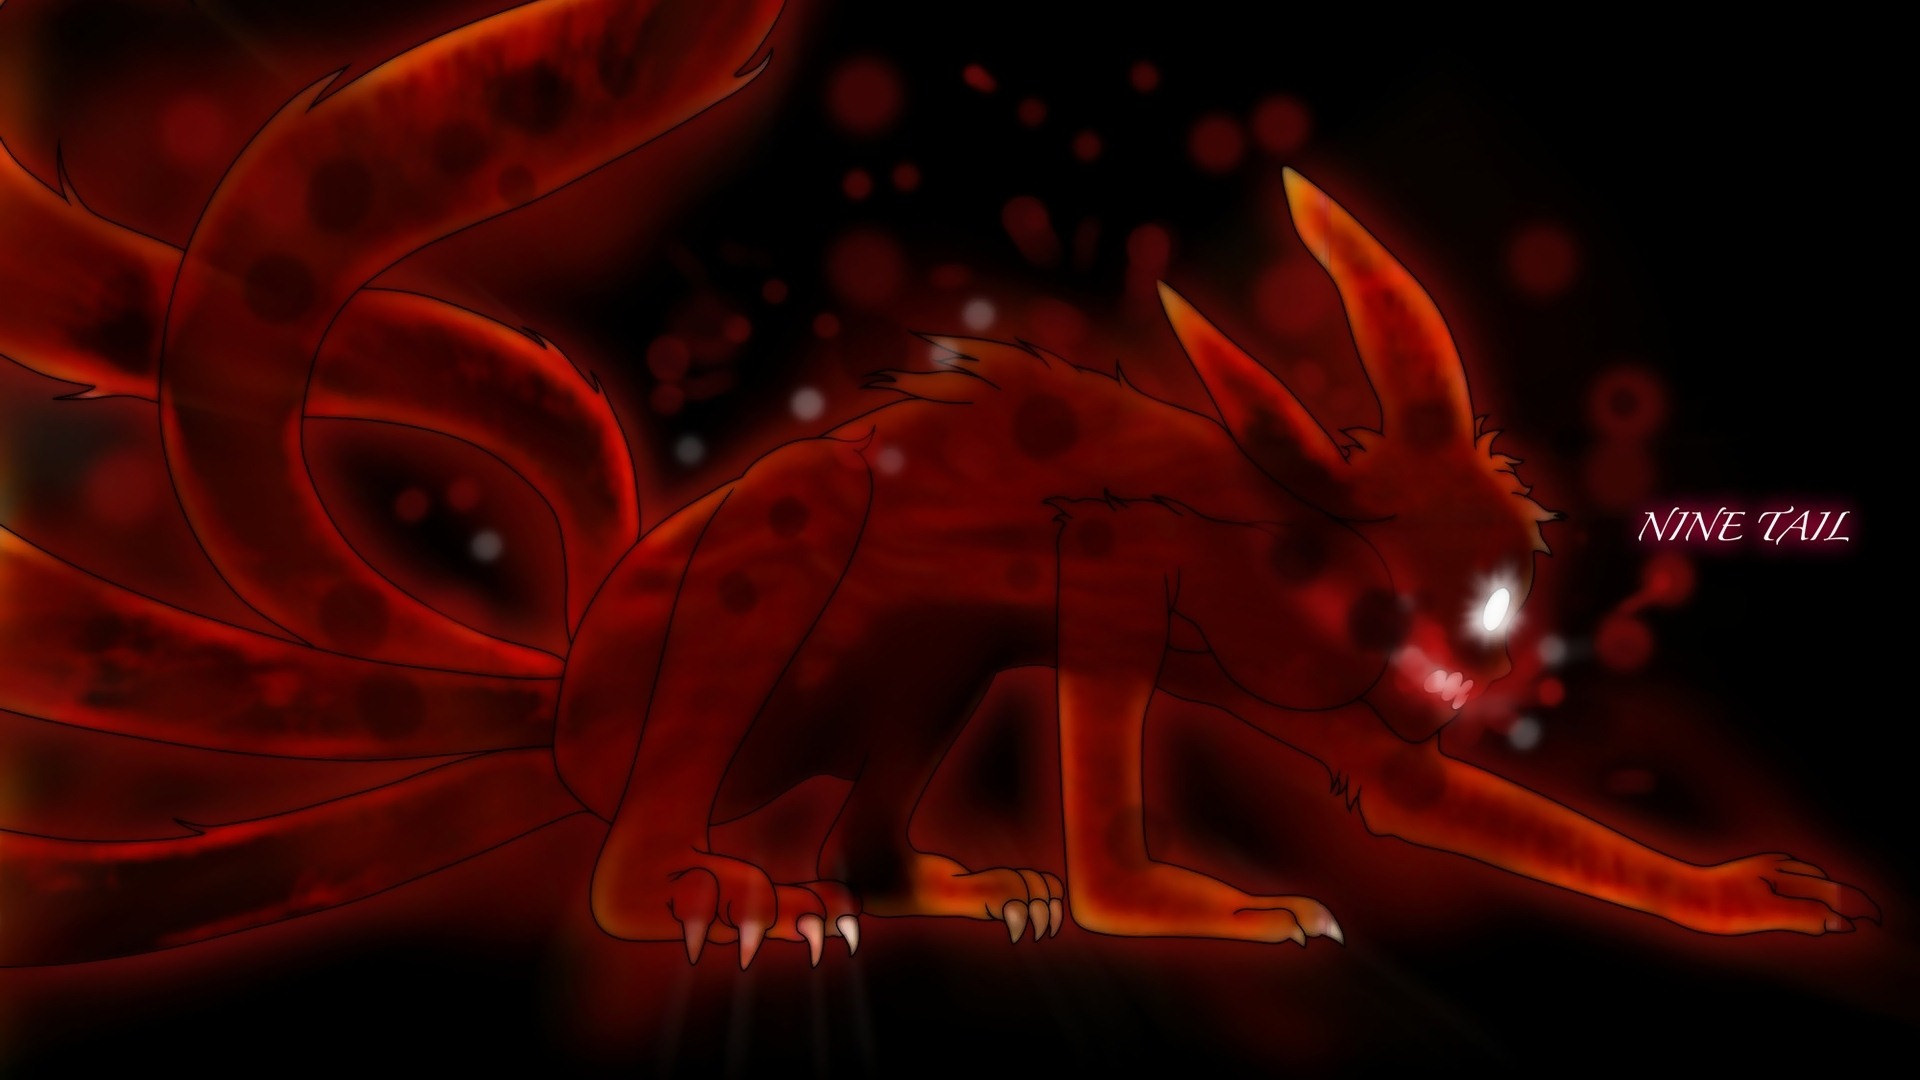 Anime HD 1800p Desktop Wallpapers Naruto Wallpapers 36 1920x1080 1920x1080